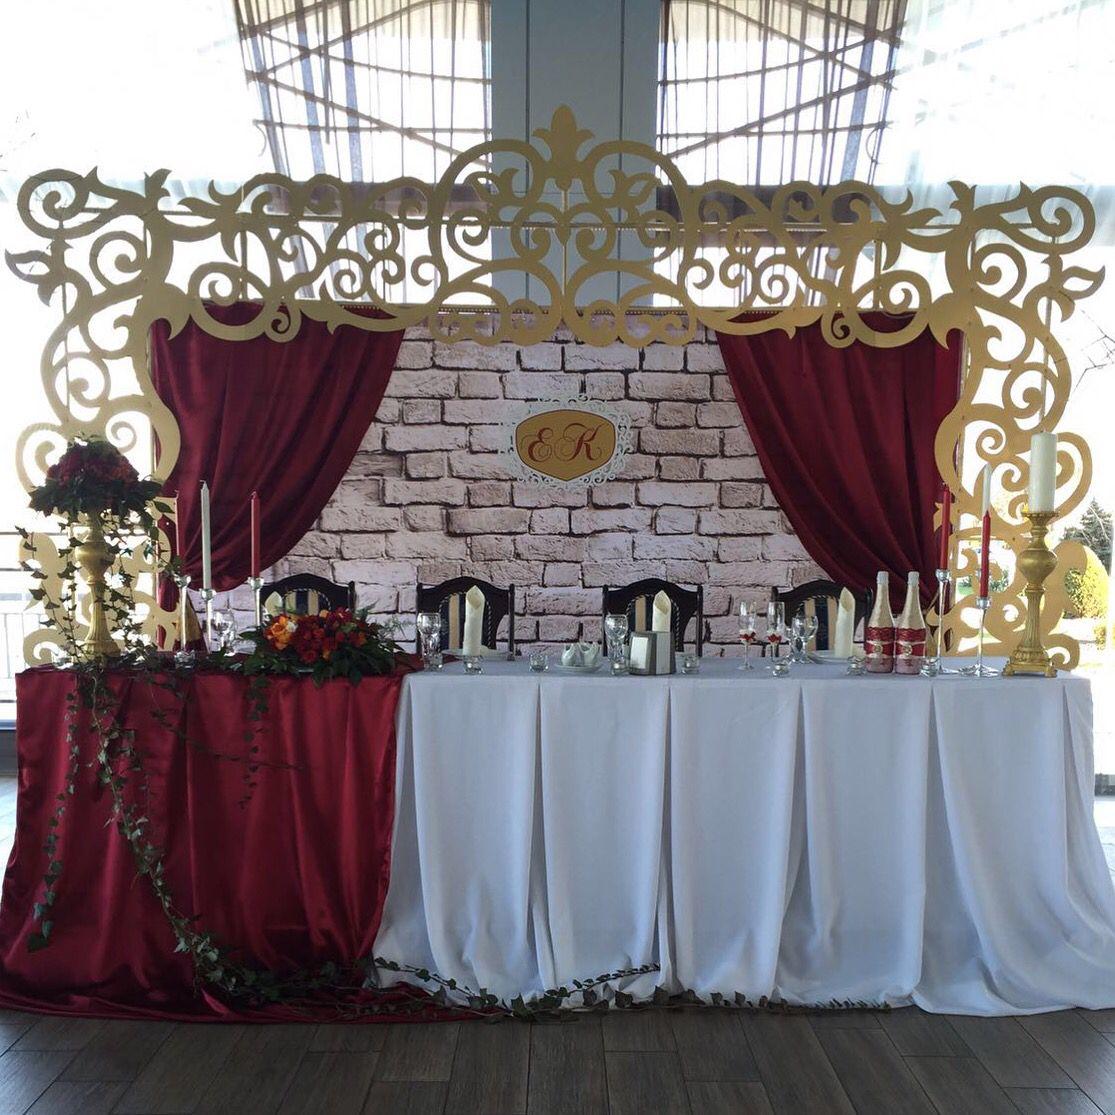 Wedding decor maroon  Свадьба марсала  Президиум молодых  Pinterest  Backdrops Wedding